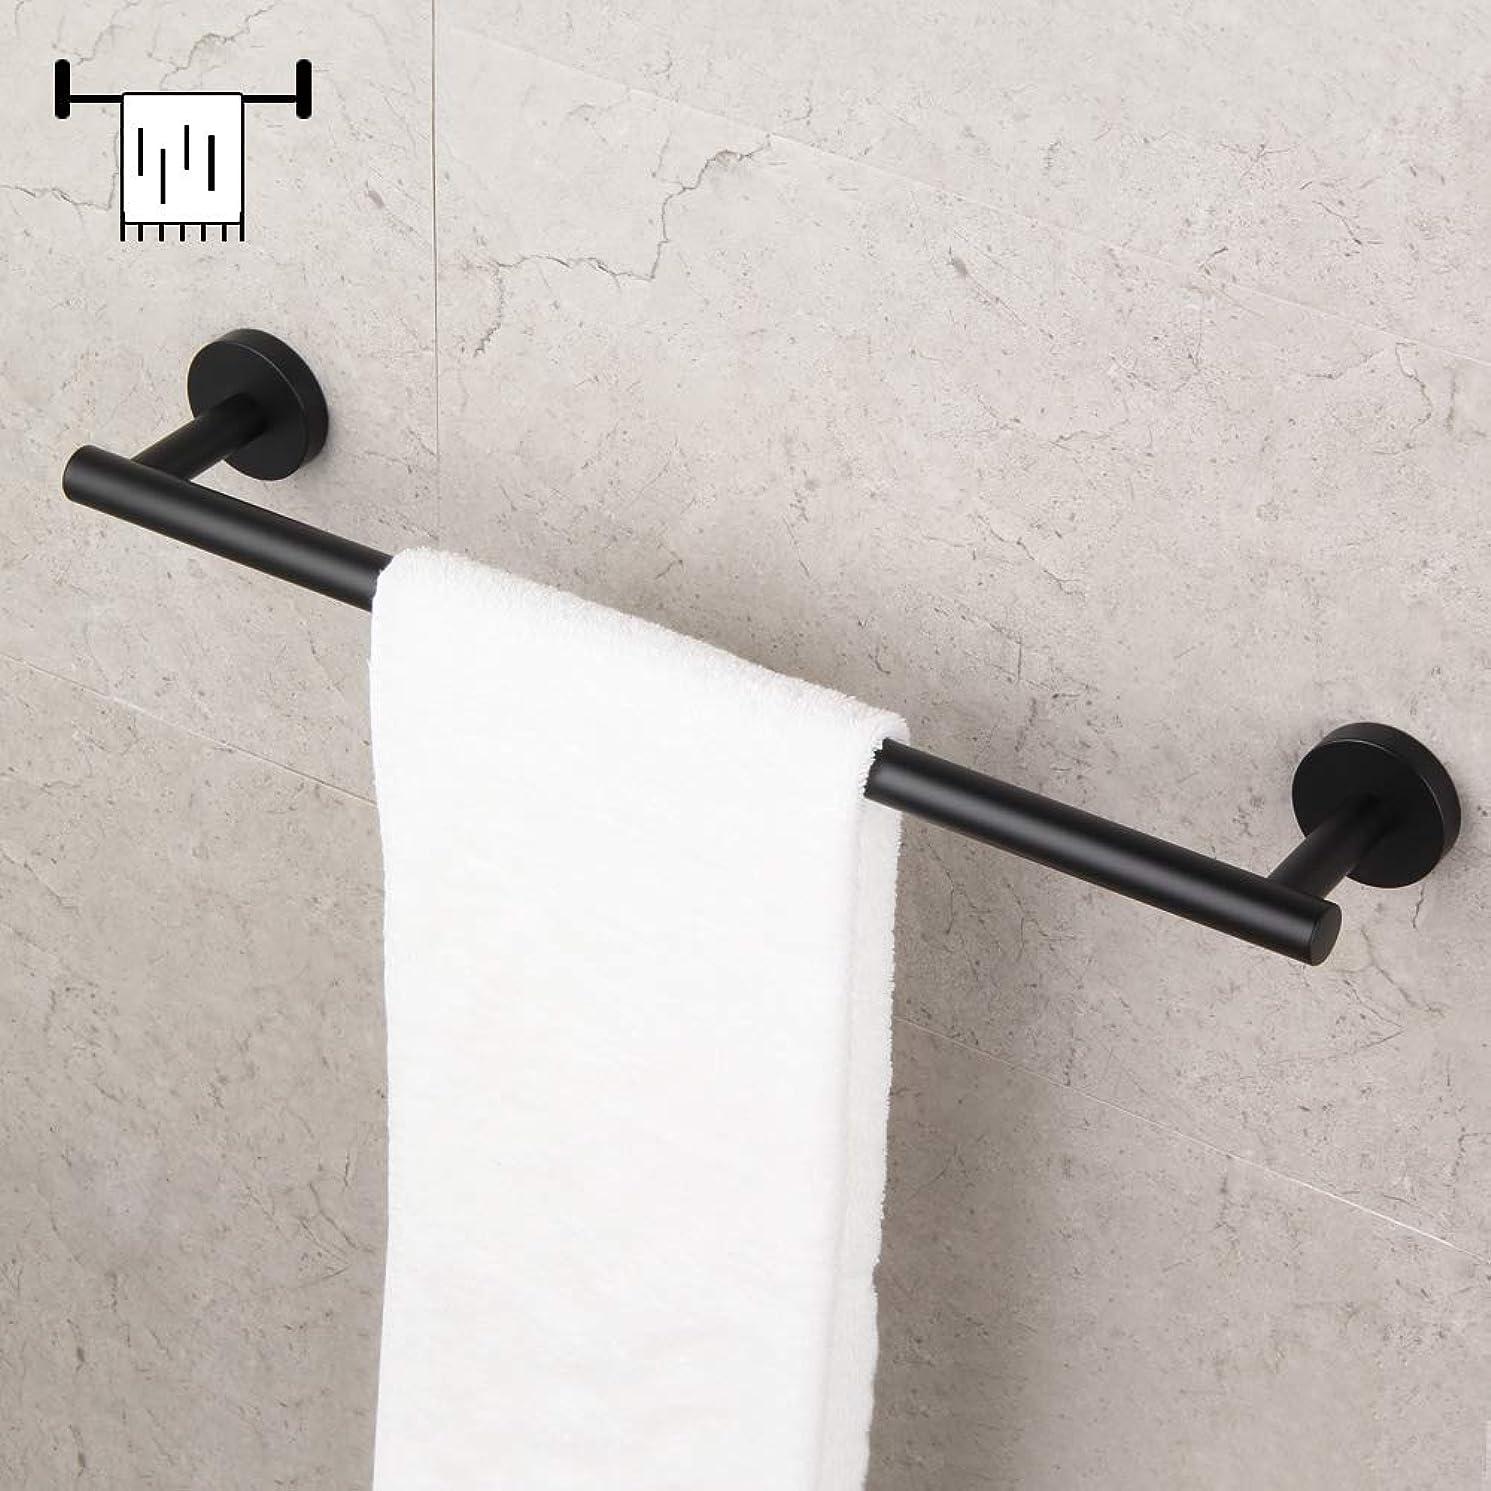 GERZ Bathroom Towel Bar 18